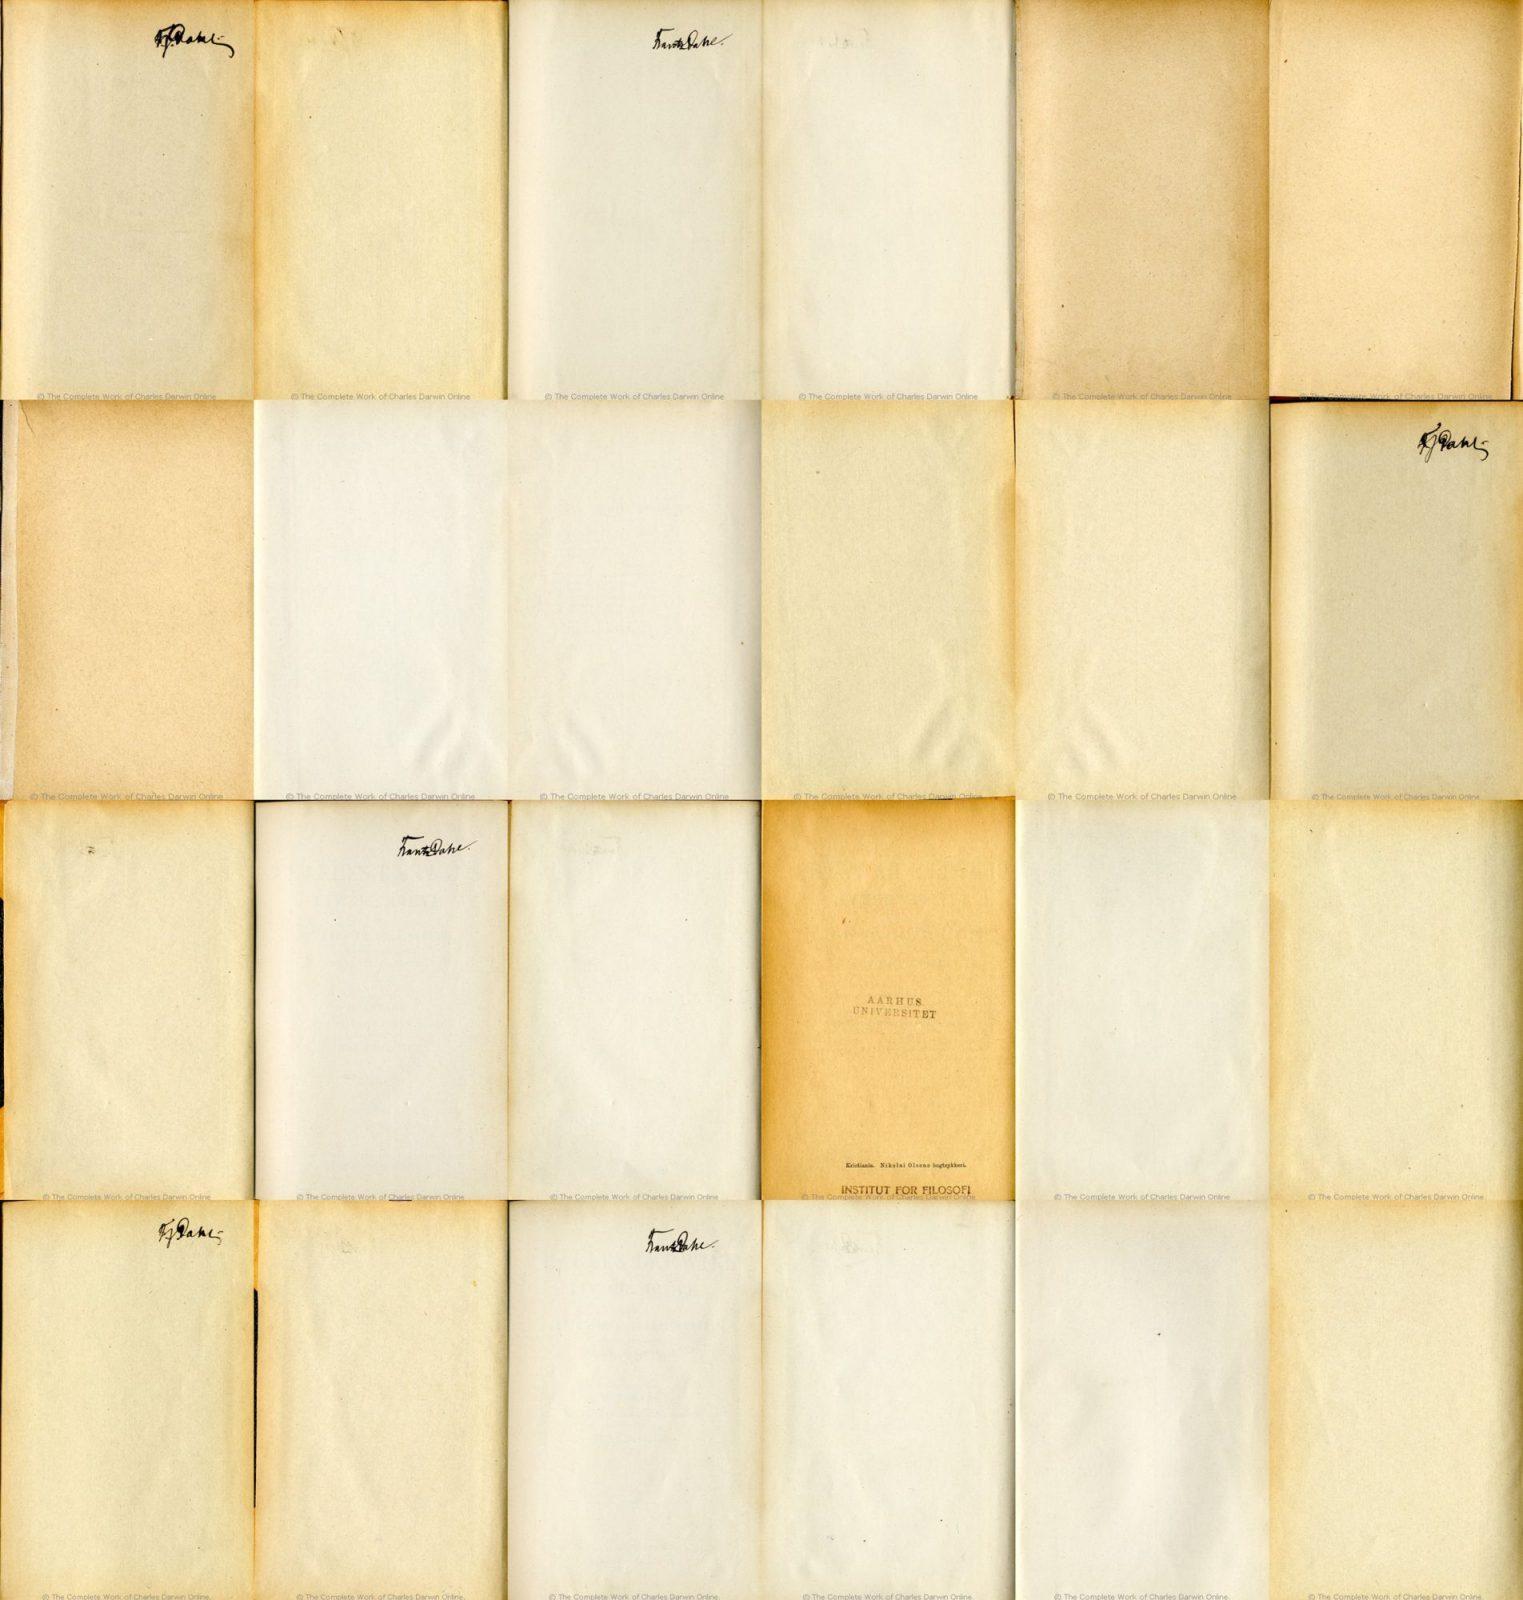 Akos Czigany: 24 Blank Pages: Francis Darwin (ed.): Charles Darwins liv og breve med et kapitel selvbiografi. Translated by Martin Simon Soraas. Fagerstrand pr. Hovik: Bibliothek for de tusen hjem. Vols. 1-3. 1889